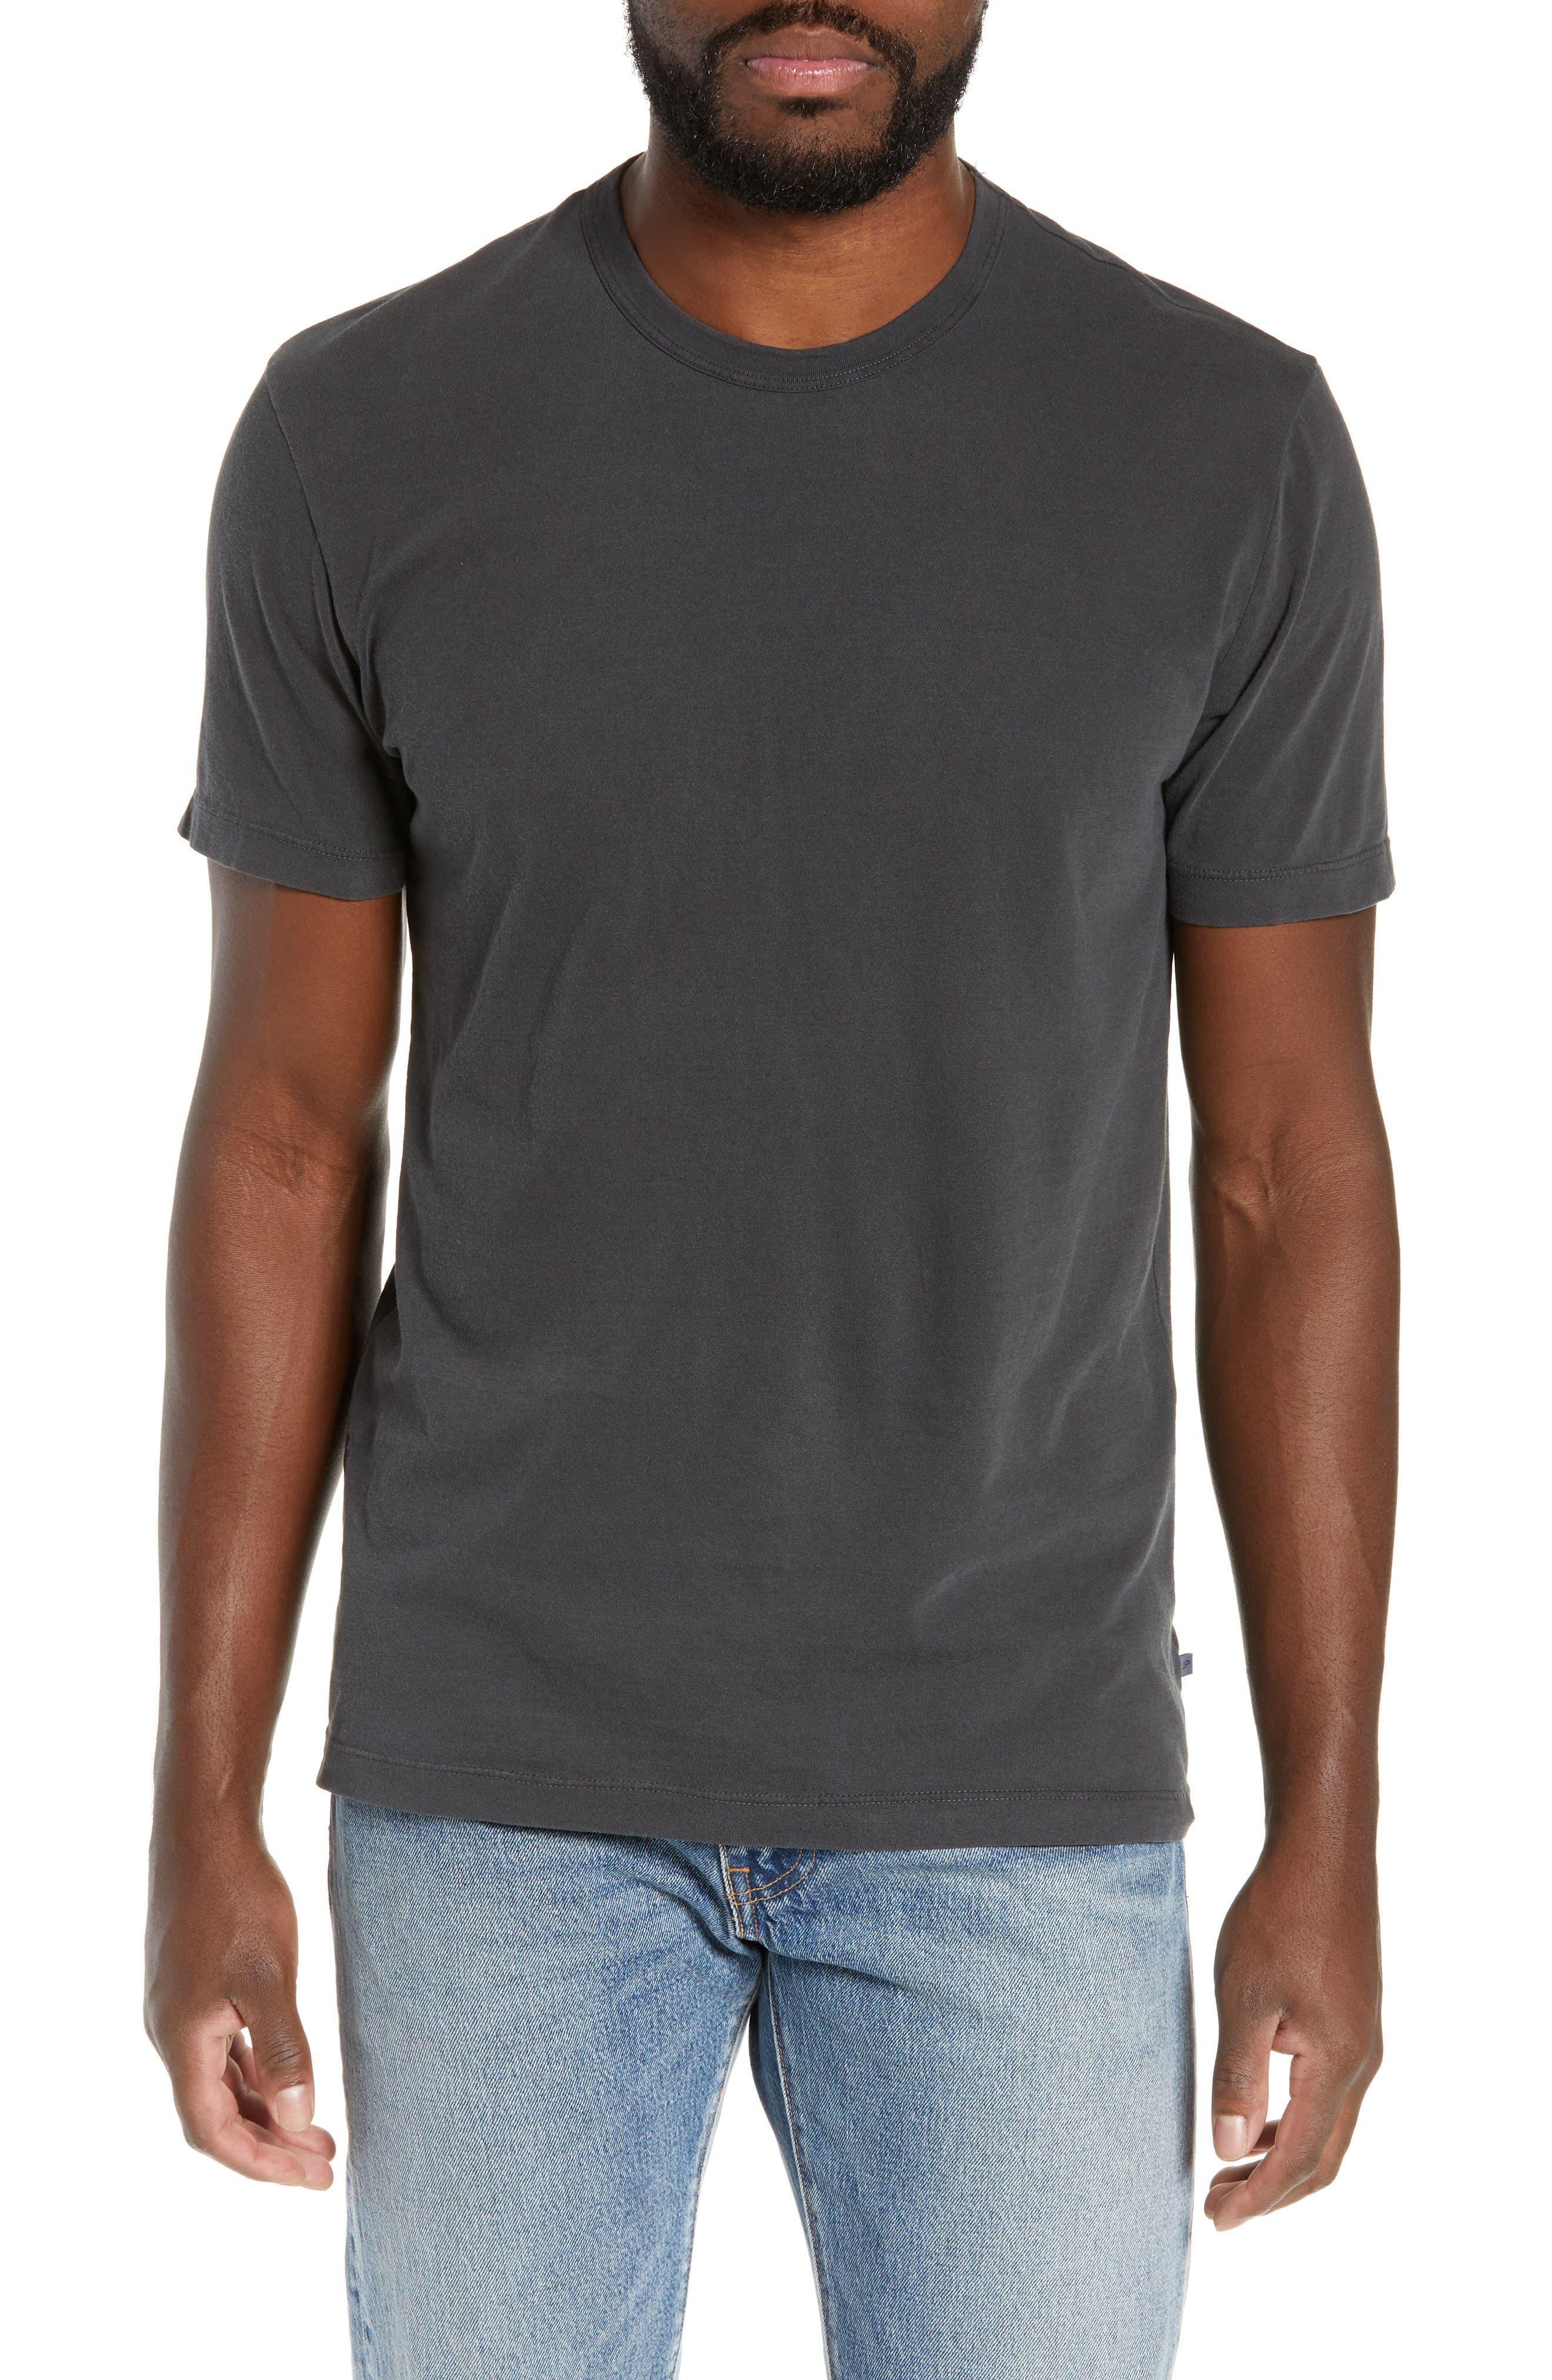 Regular Fit Tonal Palms Crewneck Shirt, Main, color, CARBON PIGMENT